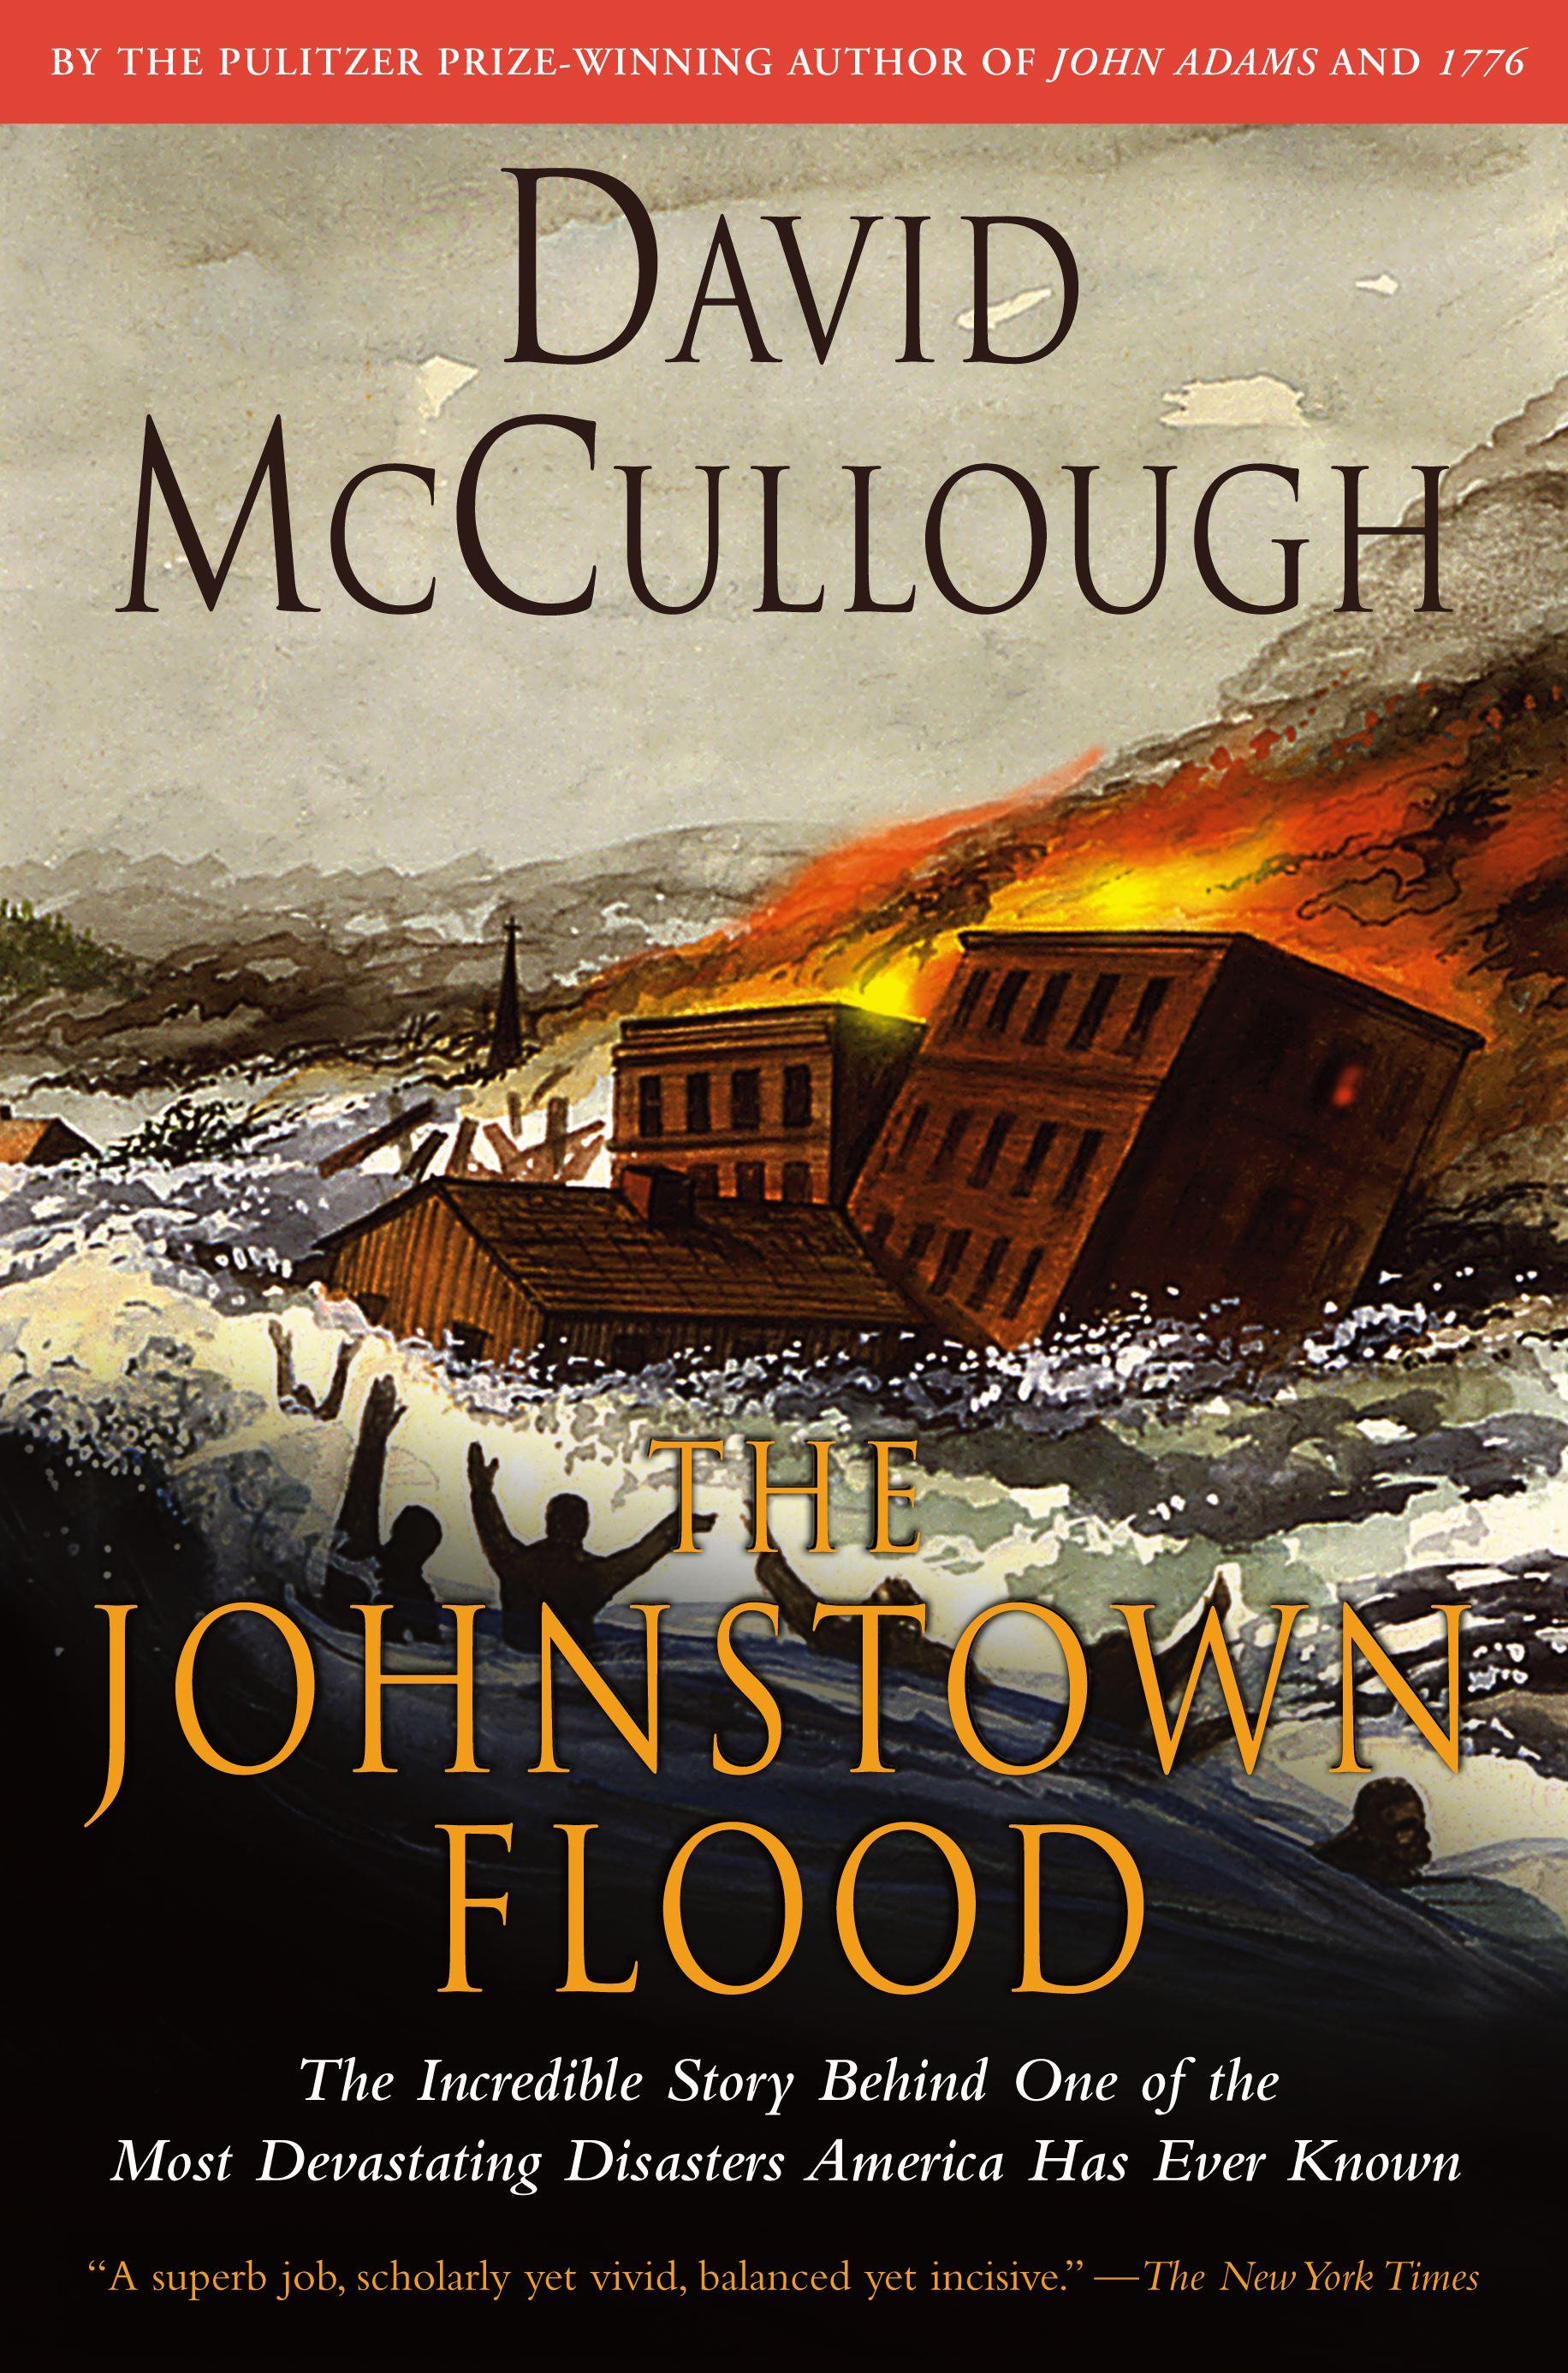 The Johnstown Flood